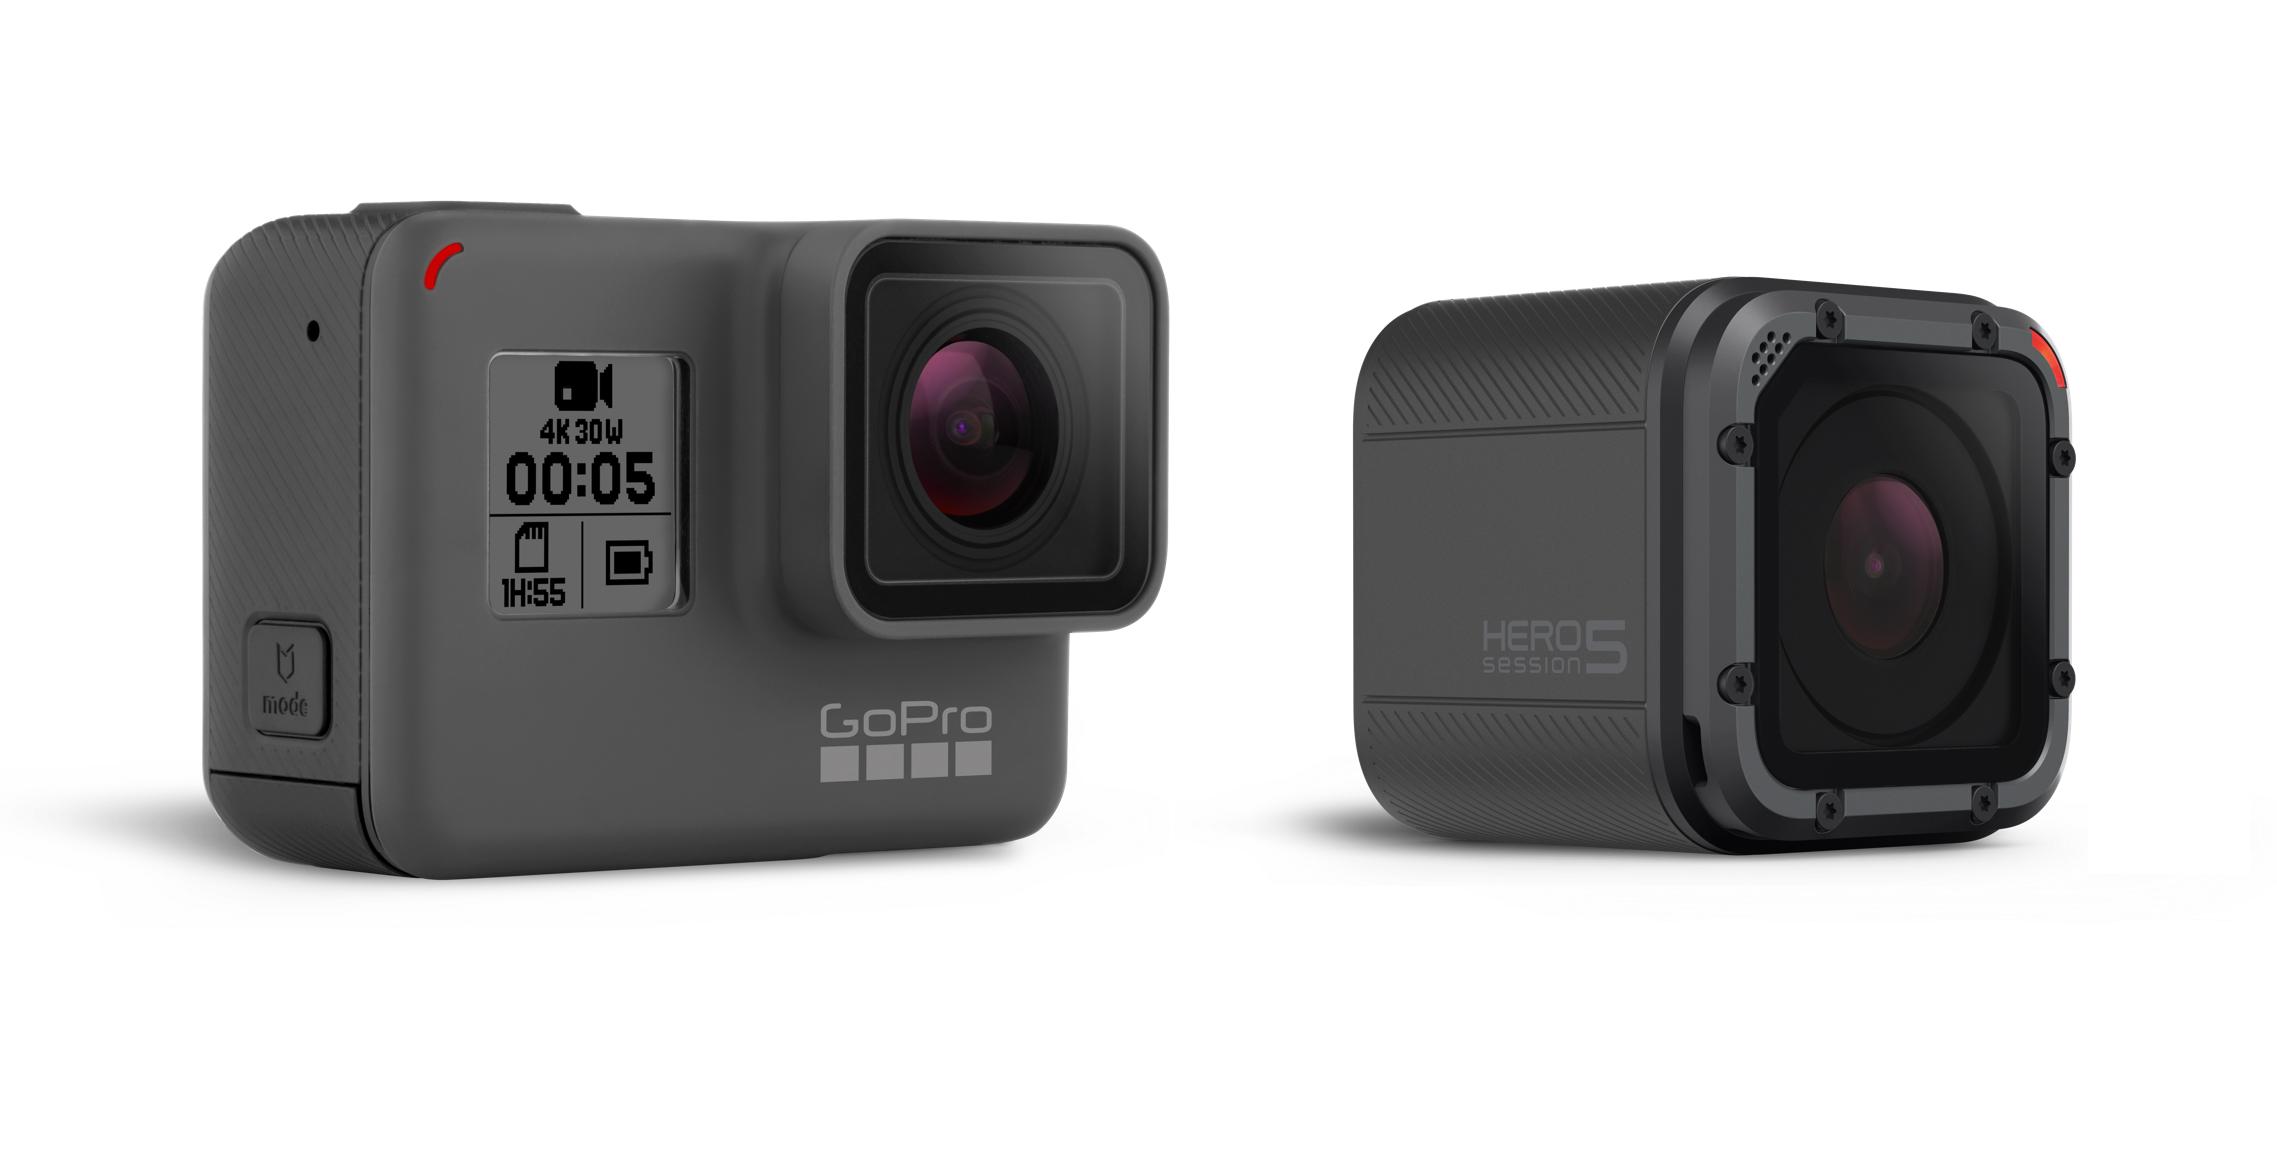 GoPro's HERO5 Black and HERO5 Session cameras